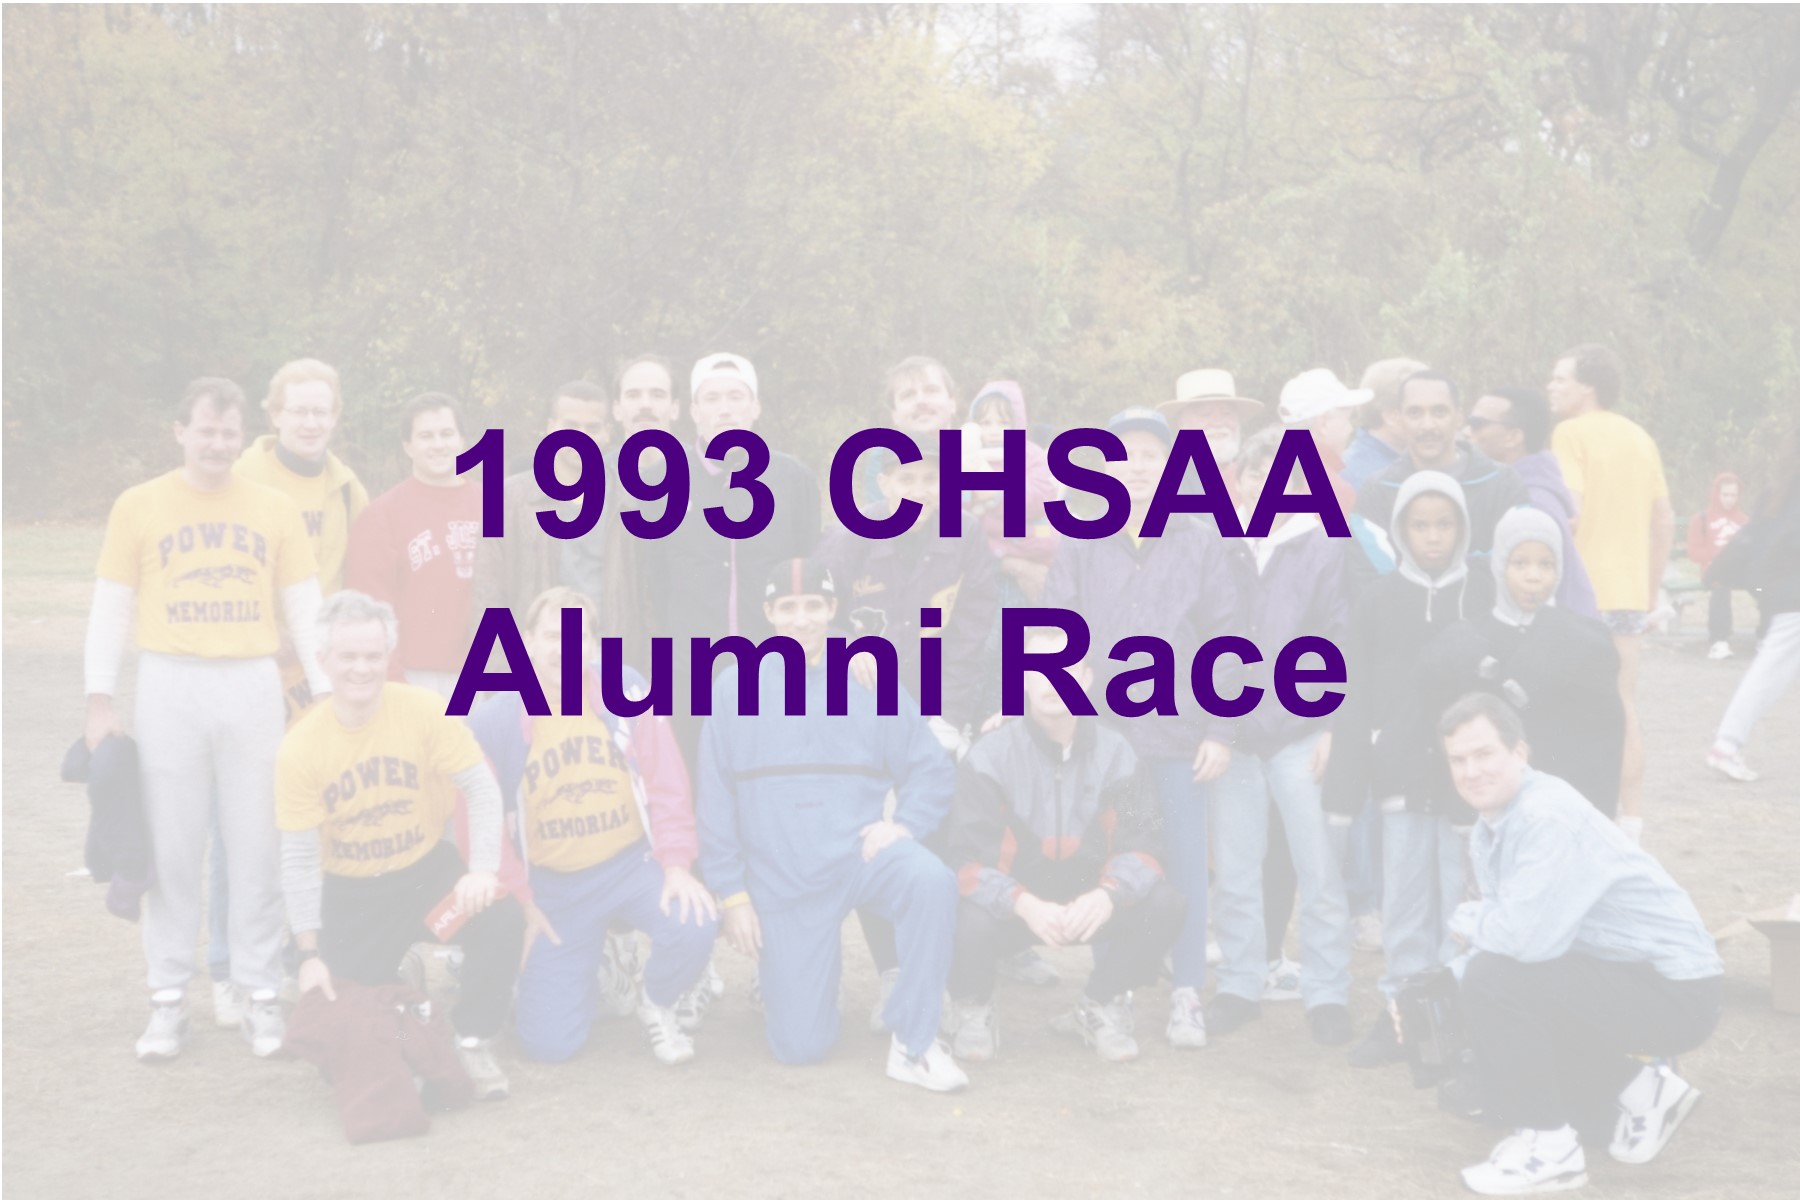 1993 Alumni Race Cover Image